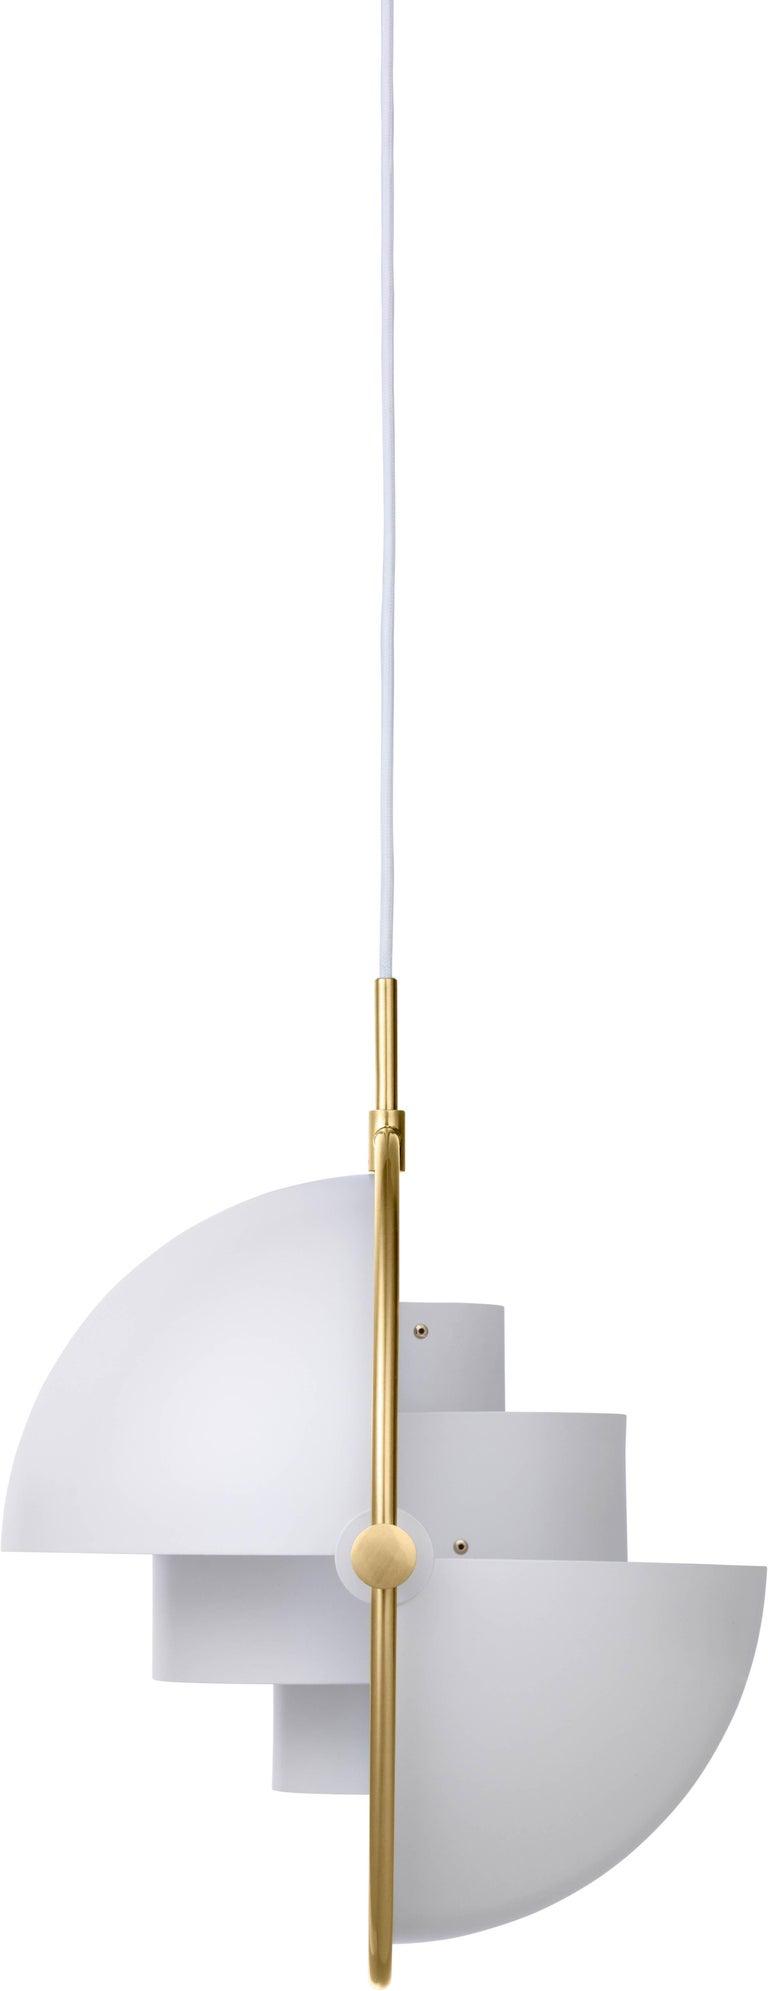 Brass multi light pendant louis weisdorf for sale at 1stdibs post modern brass multi light pendant louis weisdorf for sale aloadofball Gallery